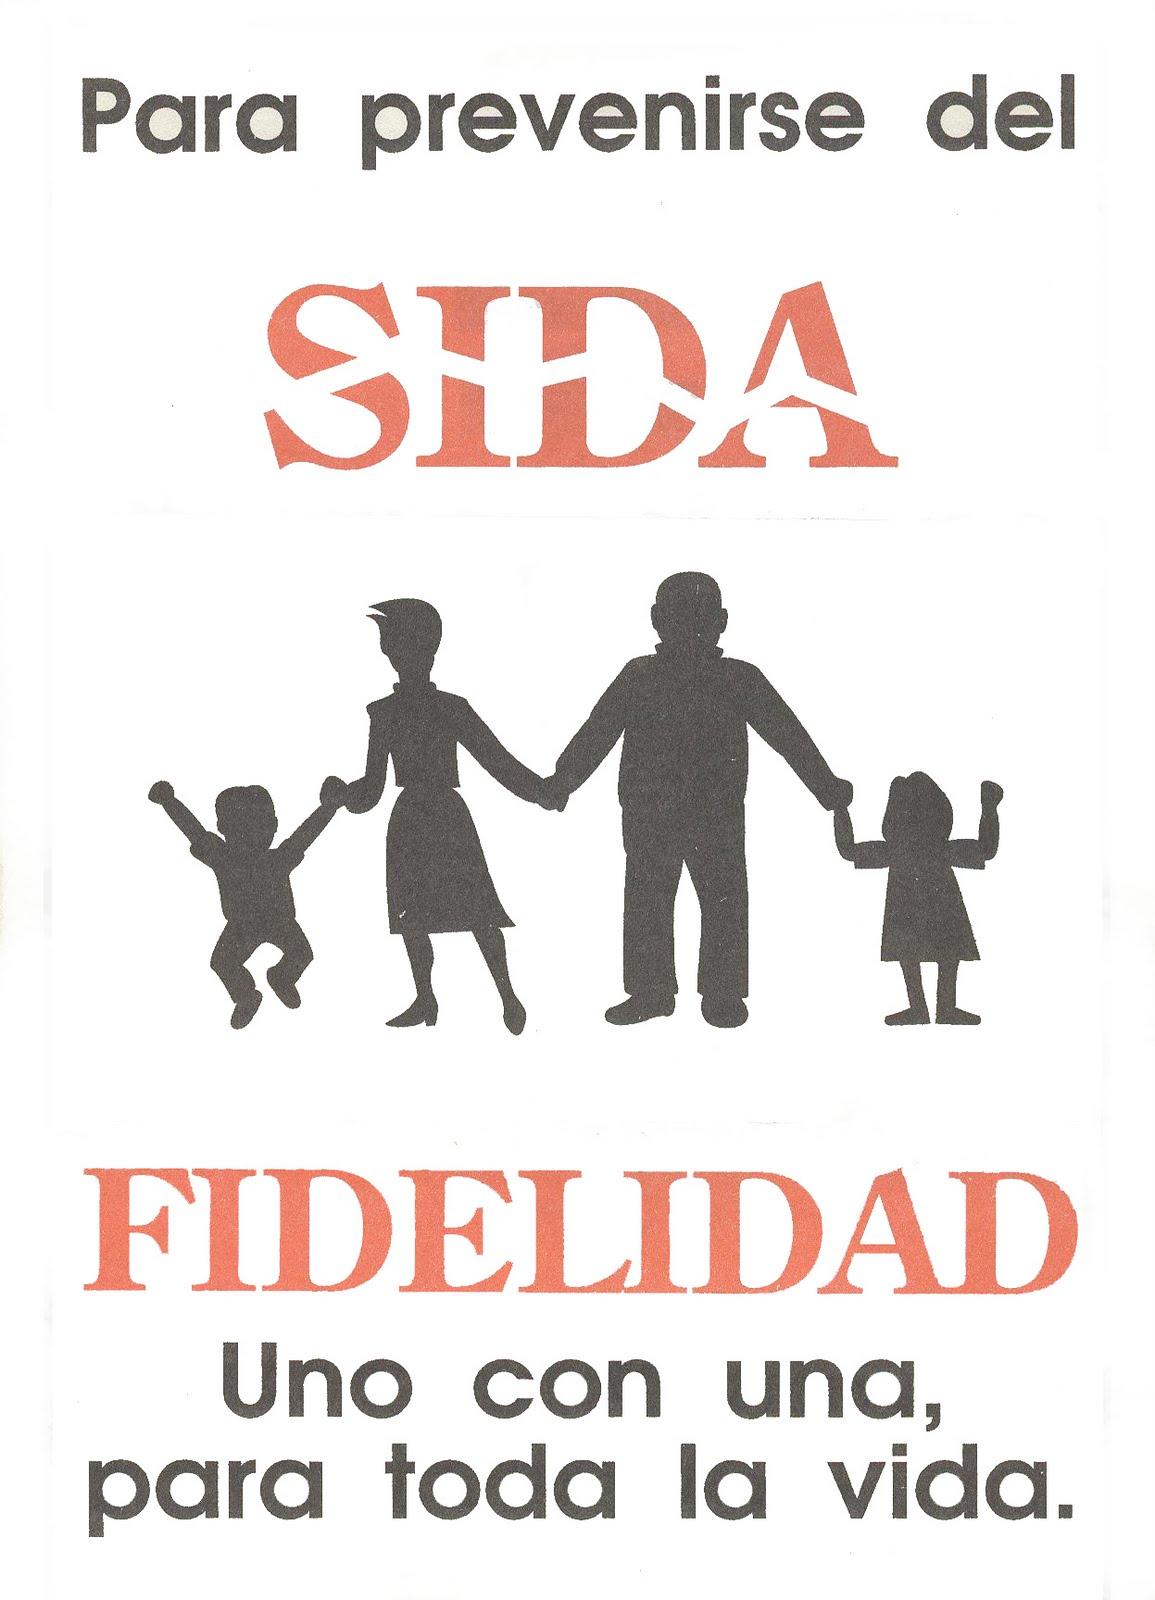 http://3.bp.blogspot.com/_Rrn5MY71rnc/S8nnaf_yroI/AAAAAAAACxs/UOX-4DKgpzc/s1600/sida+HIV+campa%C3%B1a+preventiva.jpg